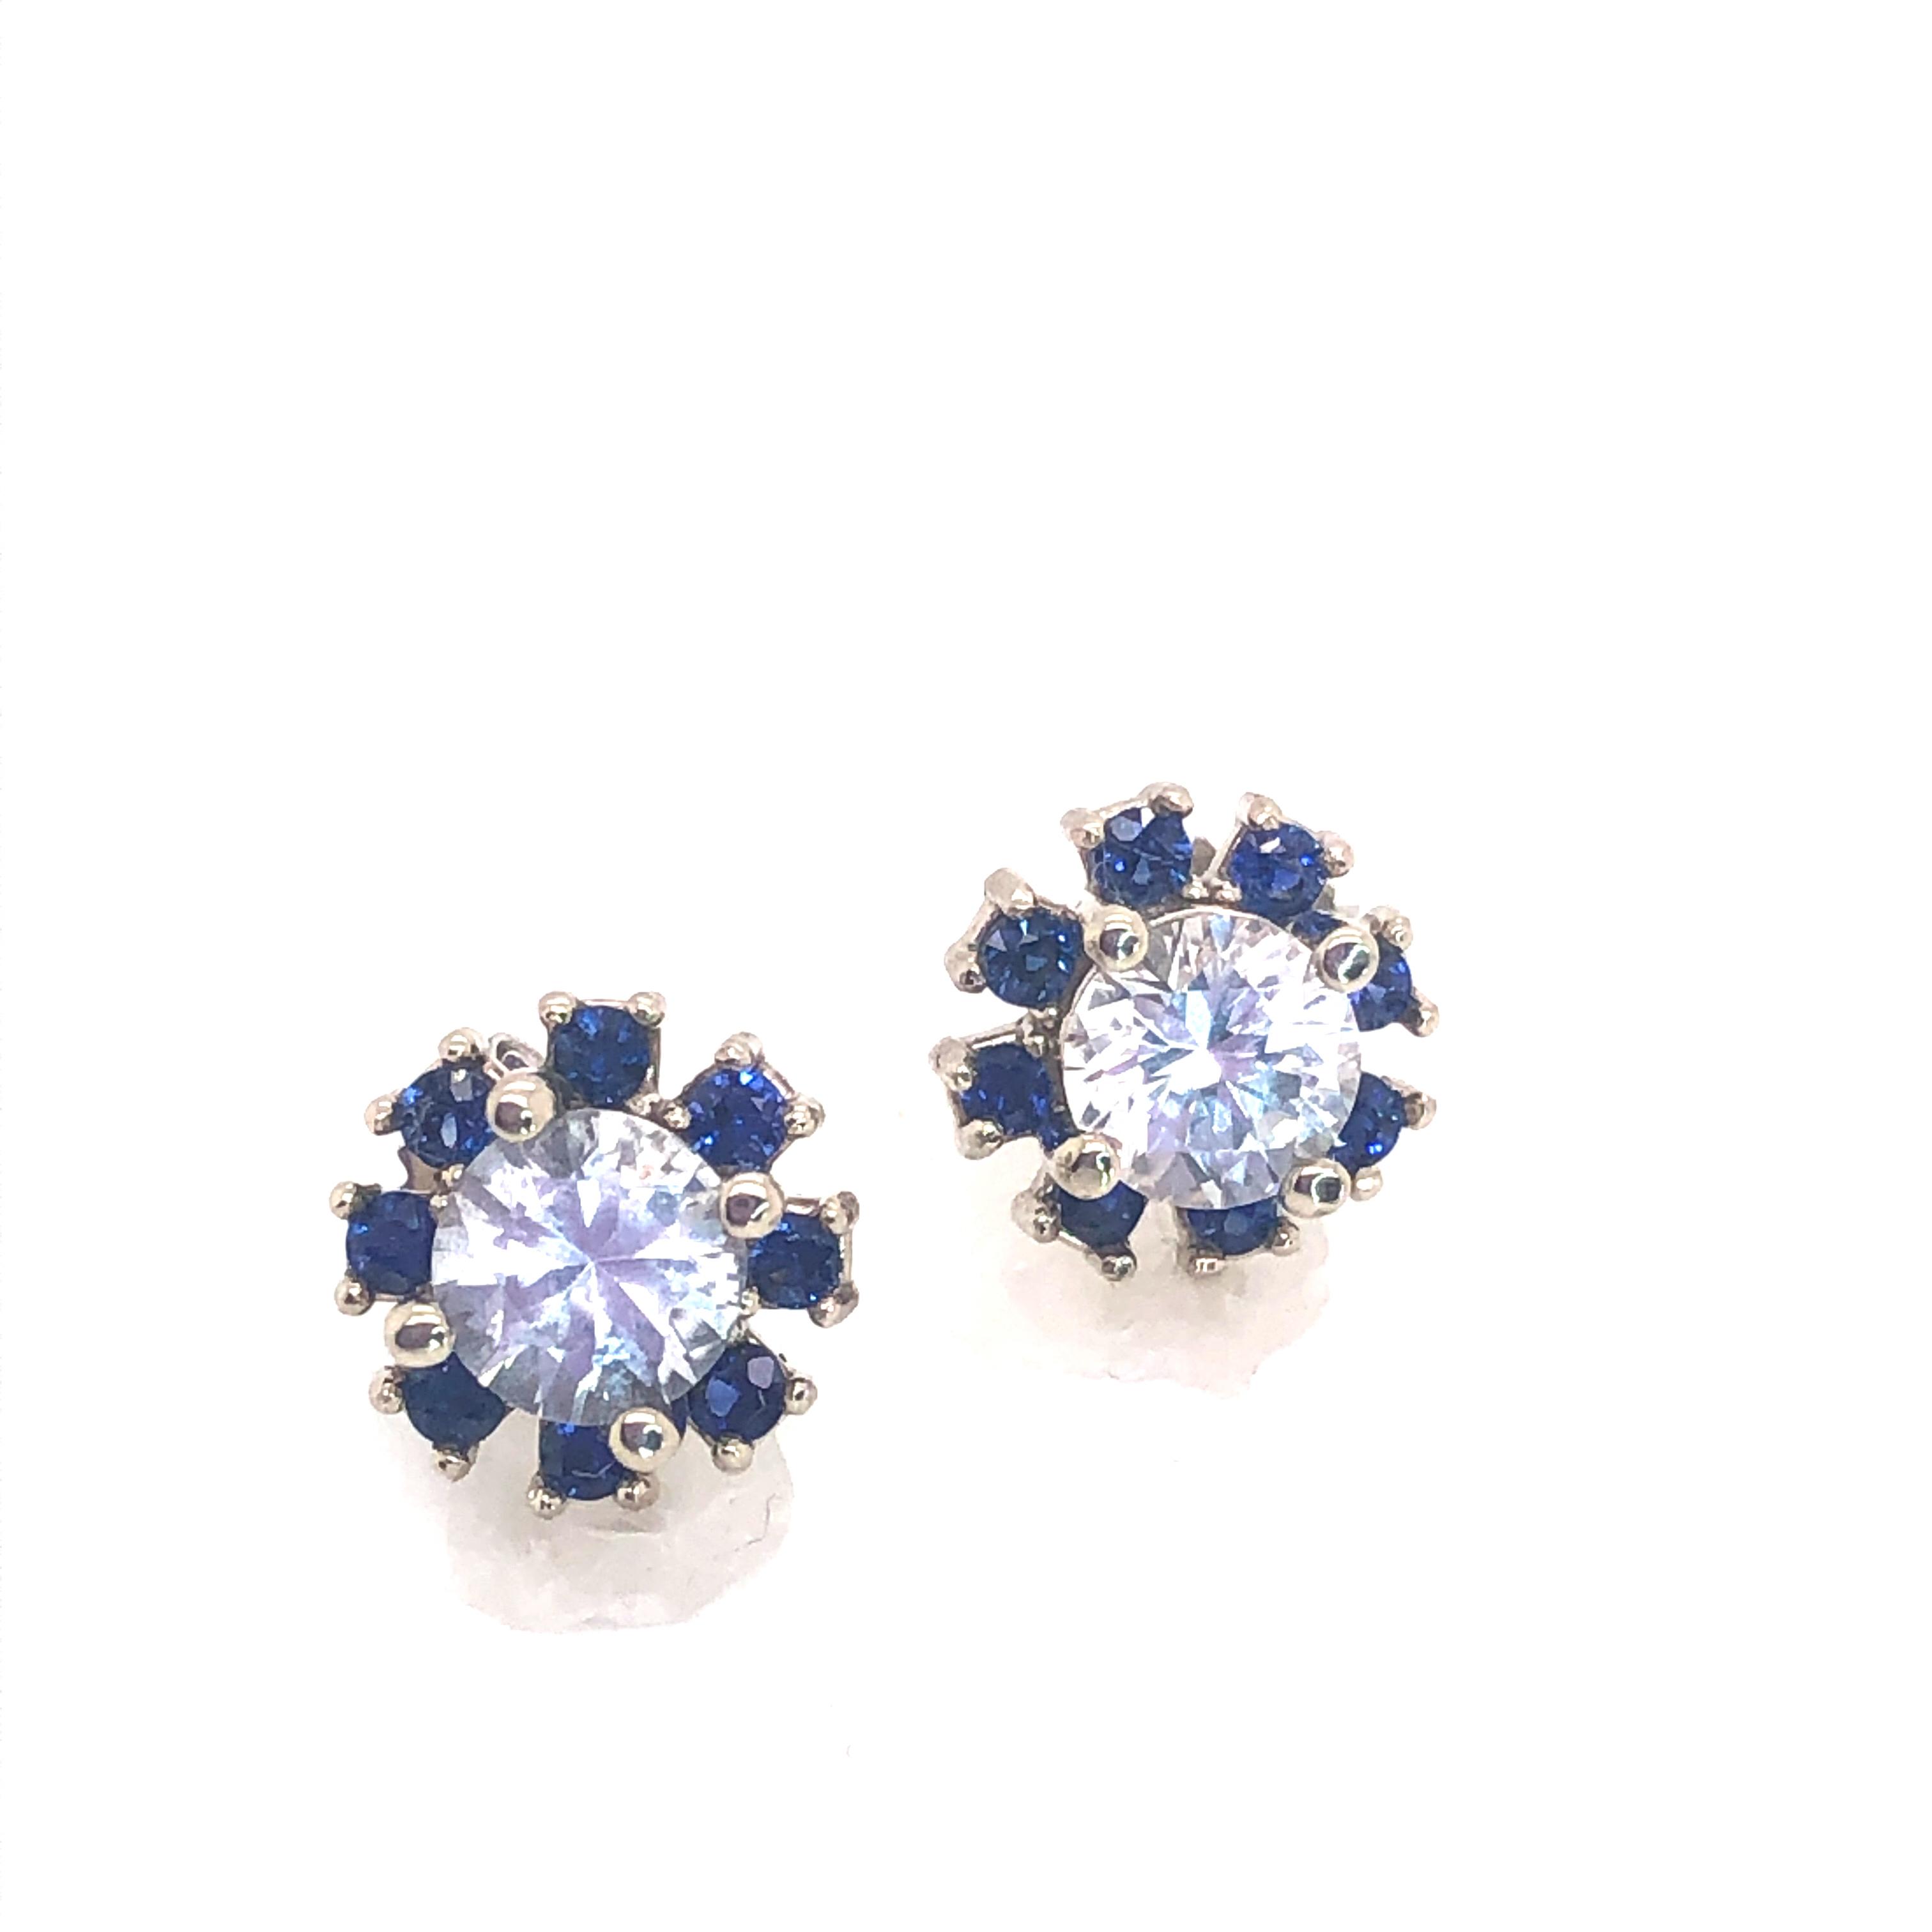 Ceylon White & Blue Sapphire (H)* Studs 14KWG 2.50 ctw